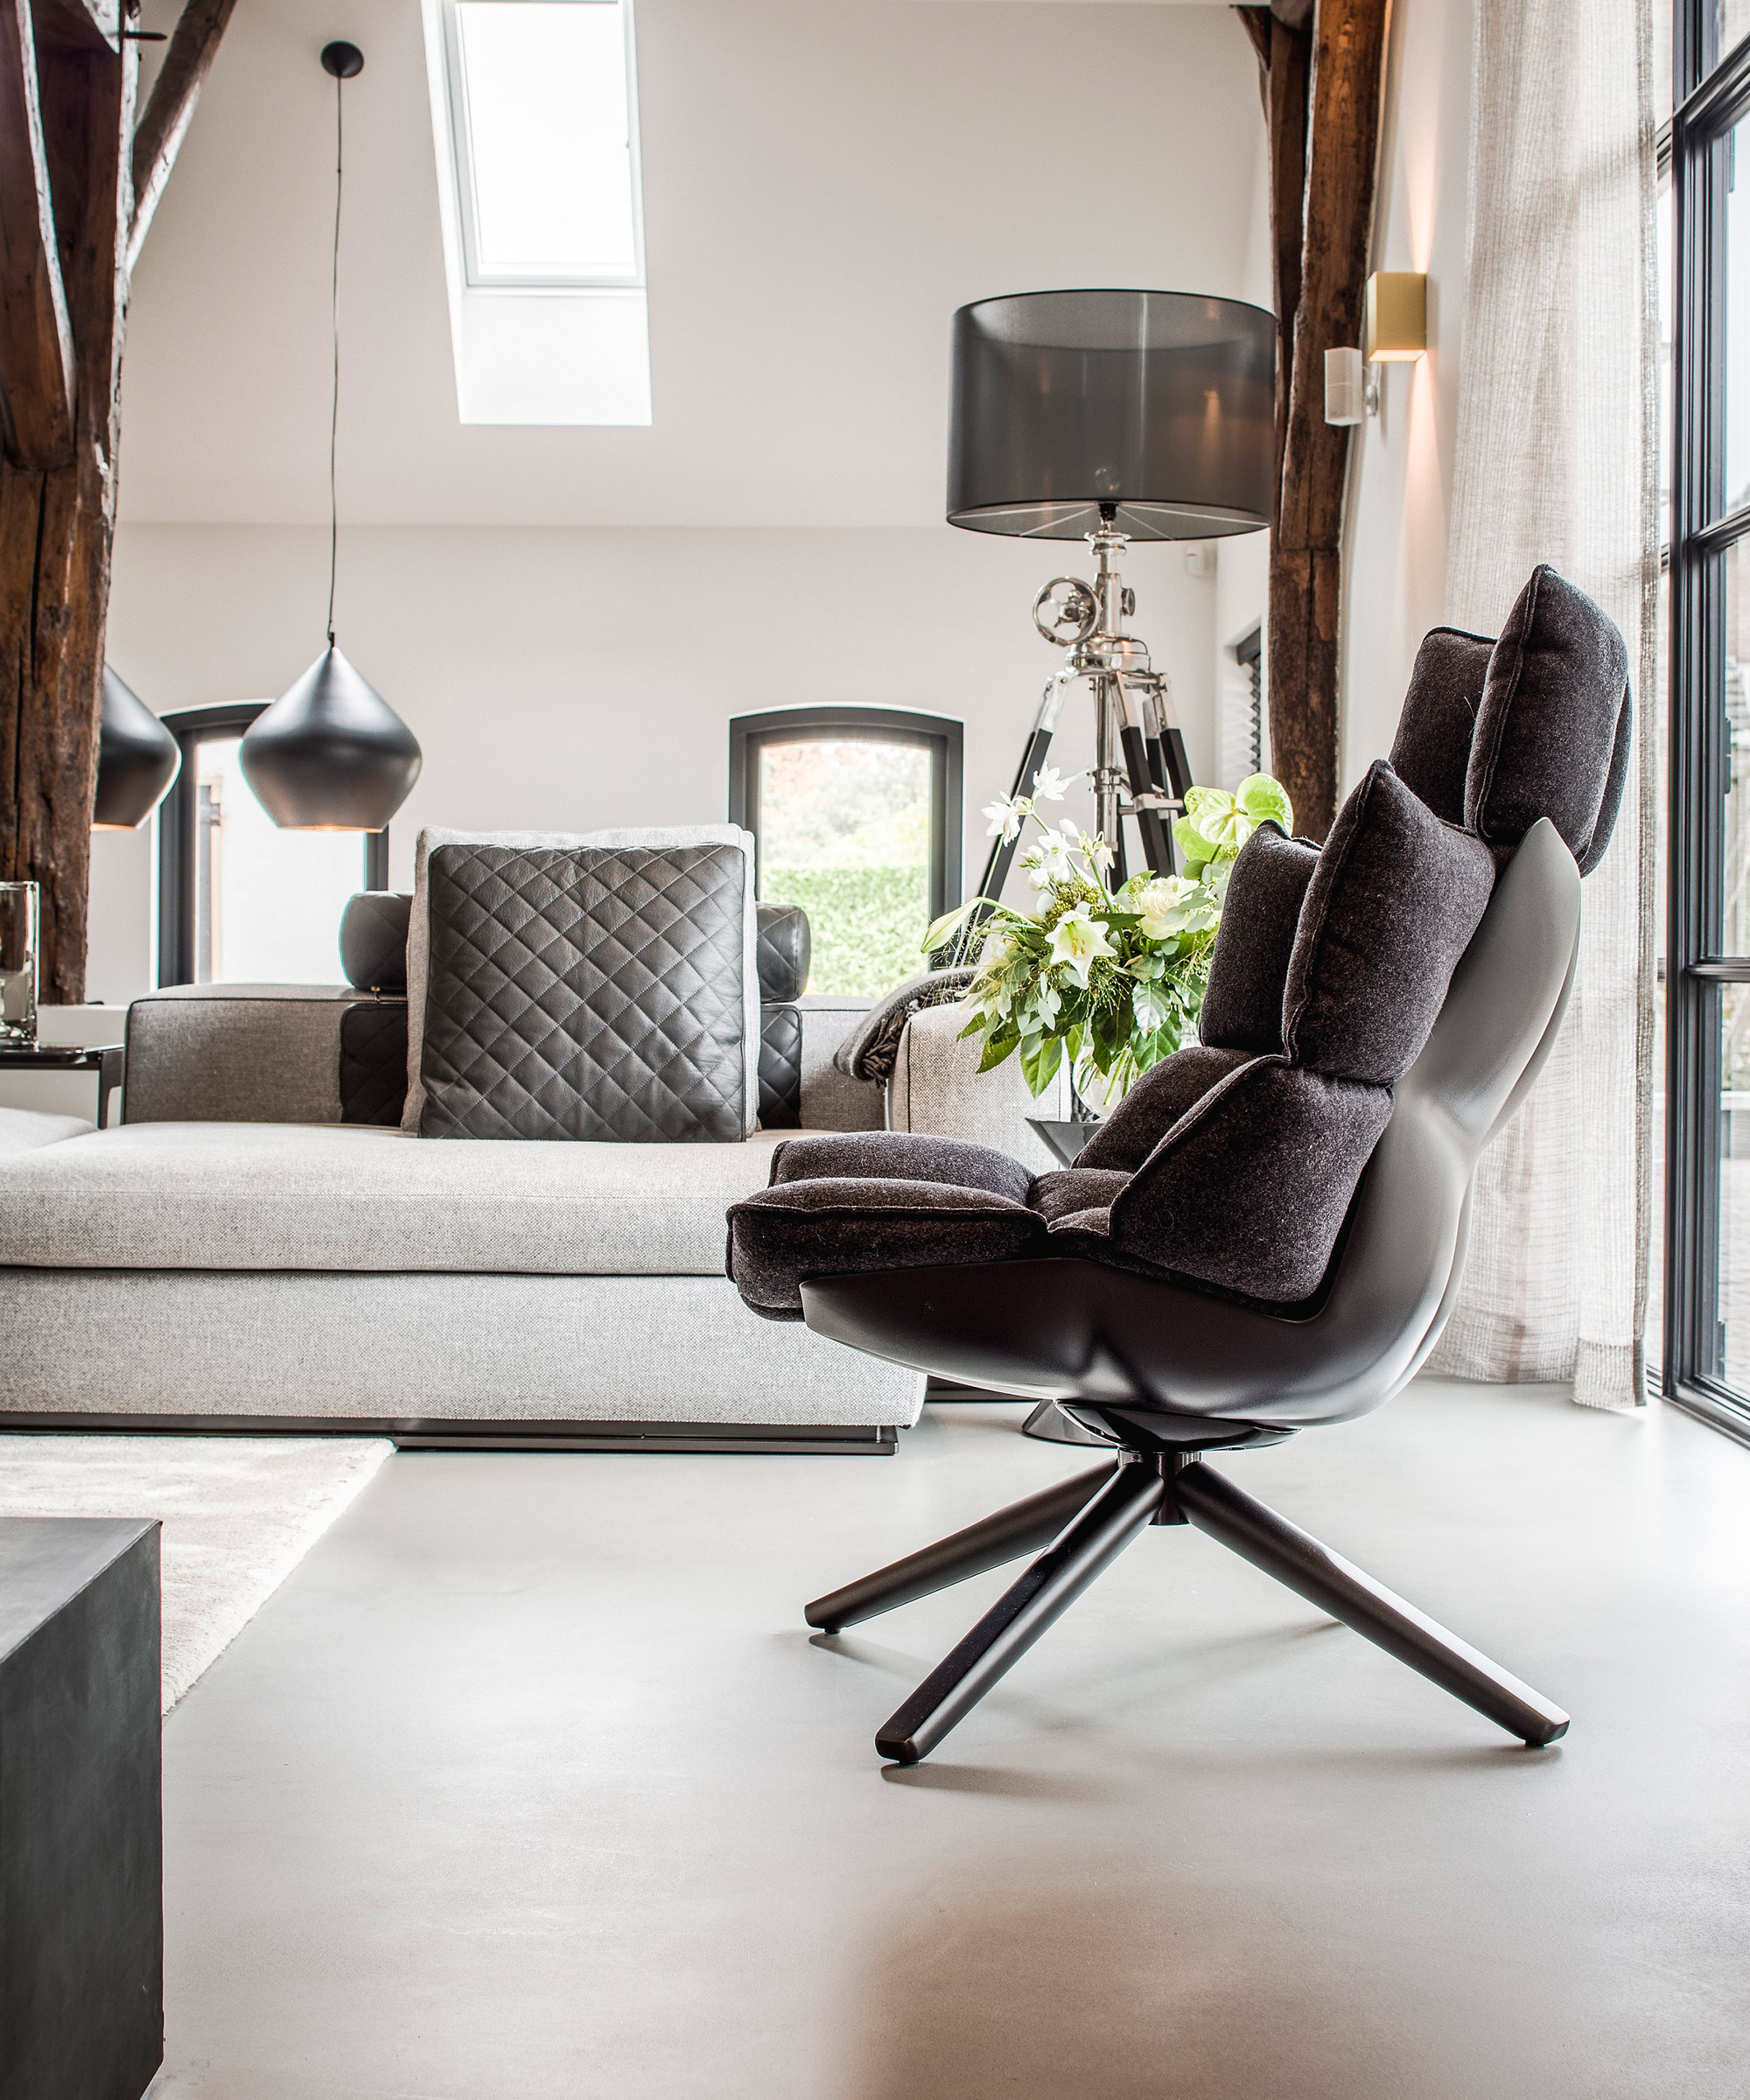 A light grey Senso floor